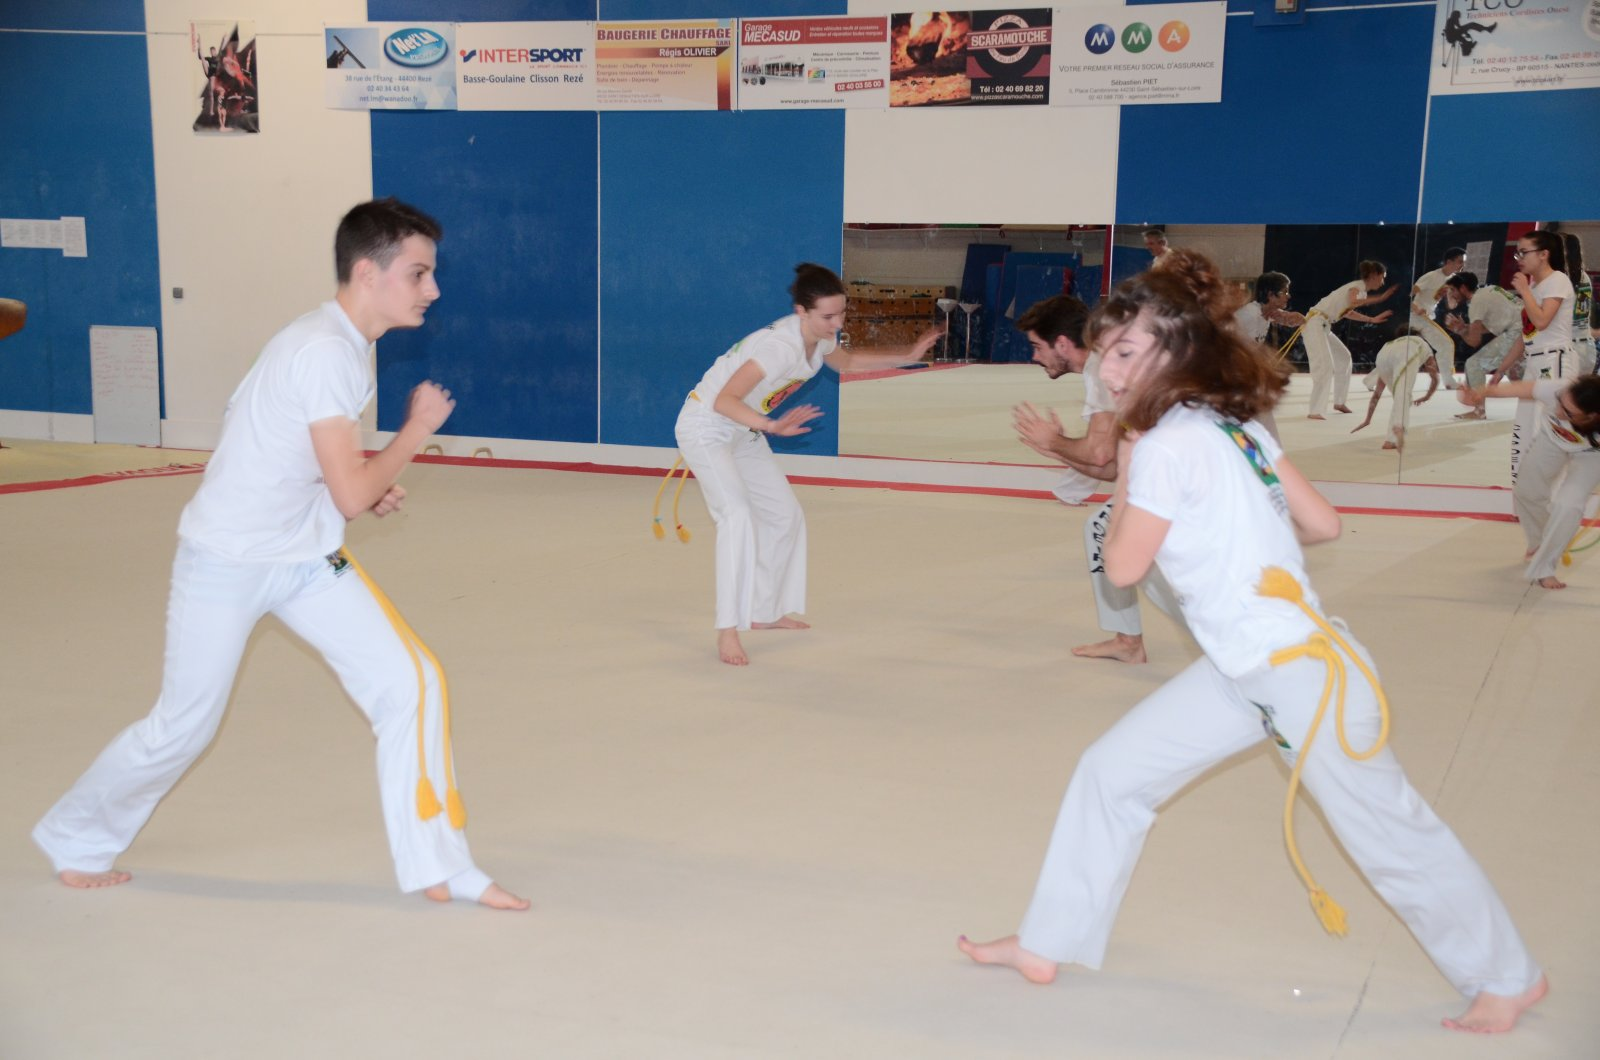 Roda E Galette 2018 Capoeira Nantes (23)